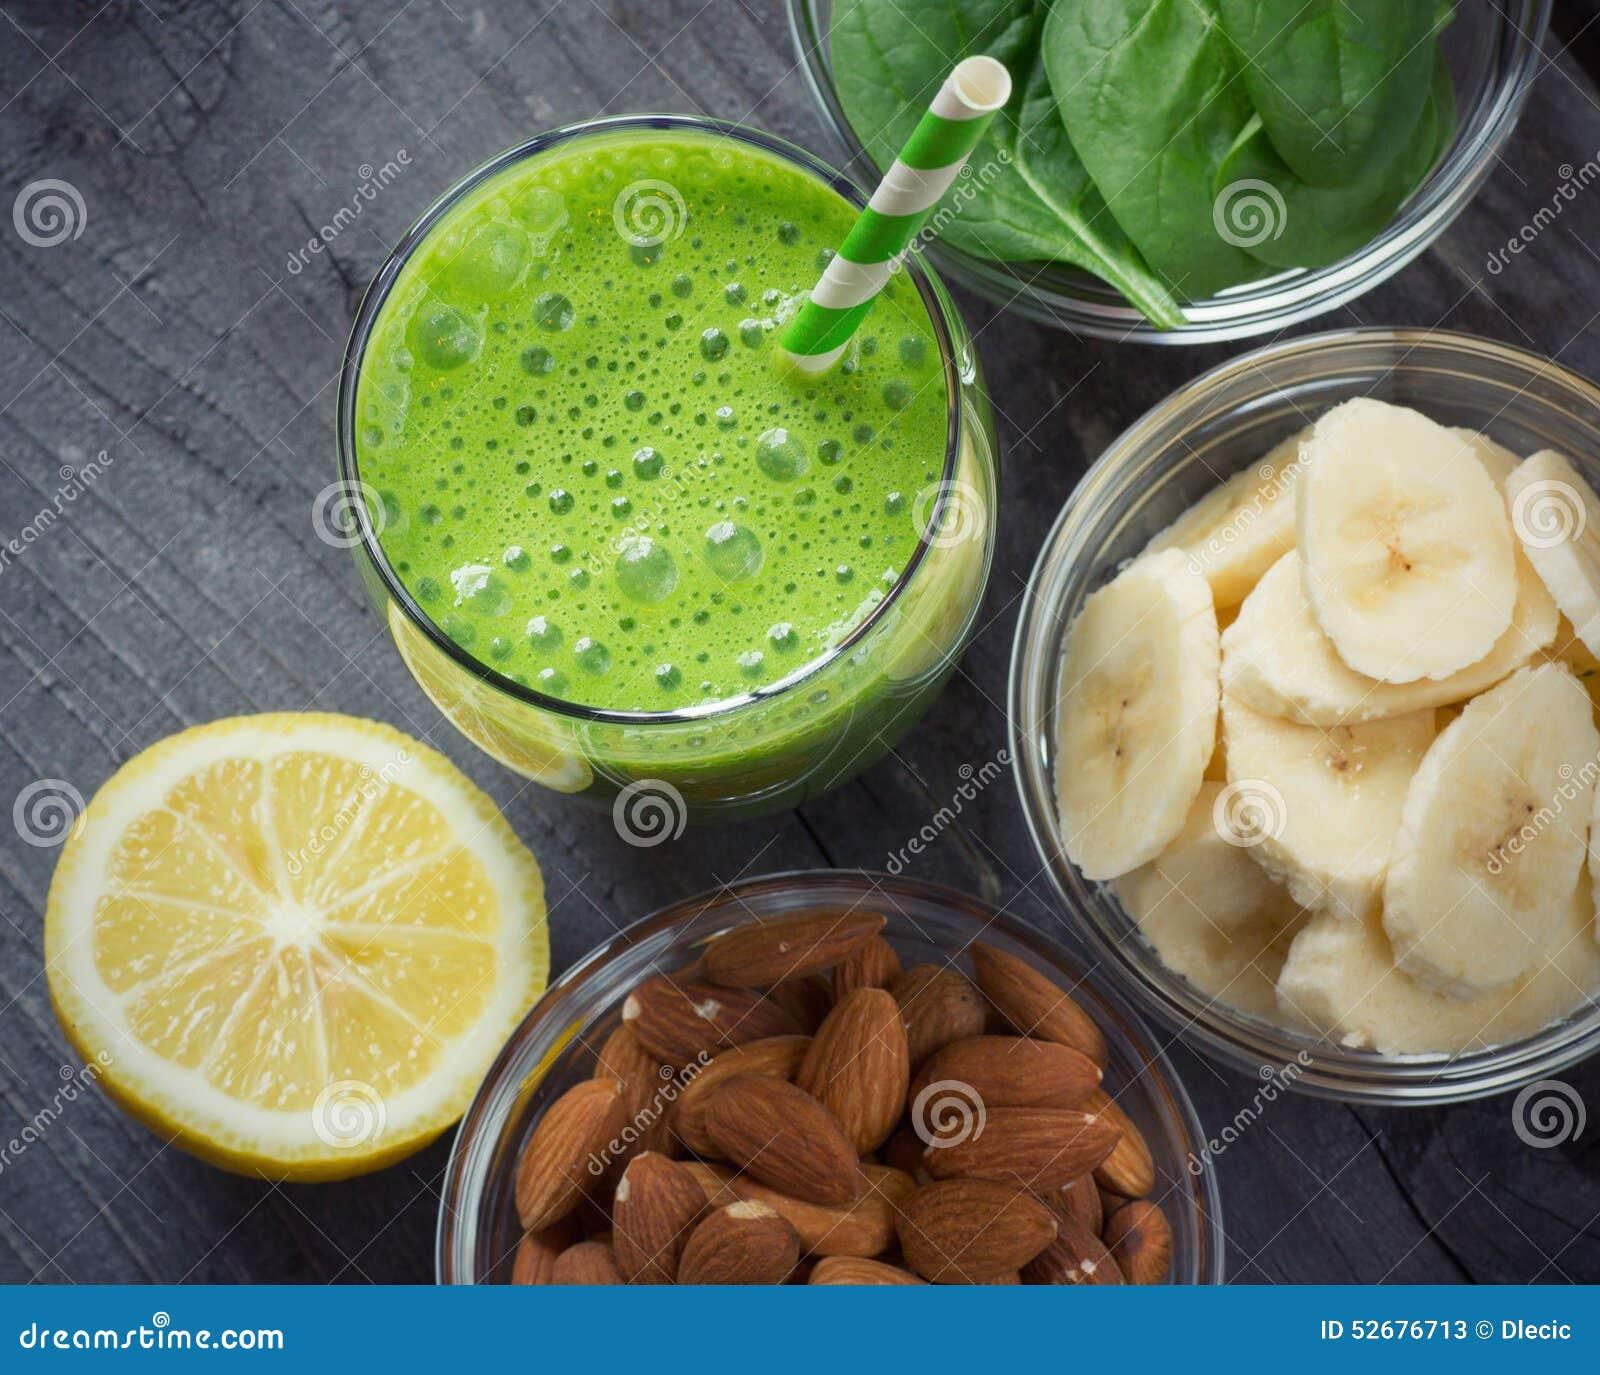 blue fruits healthy yogurt fruit smoothie